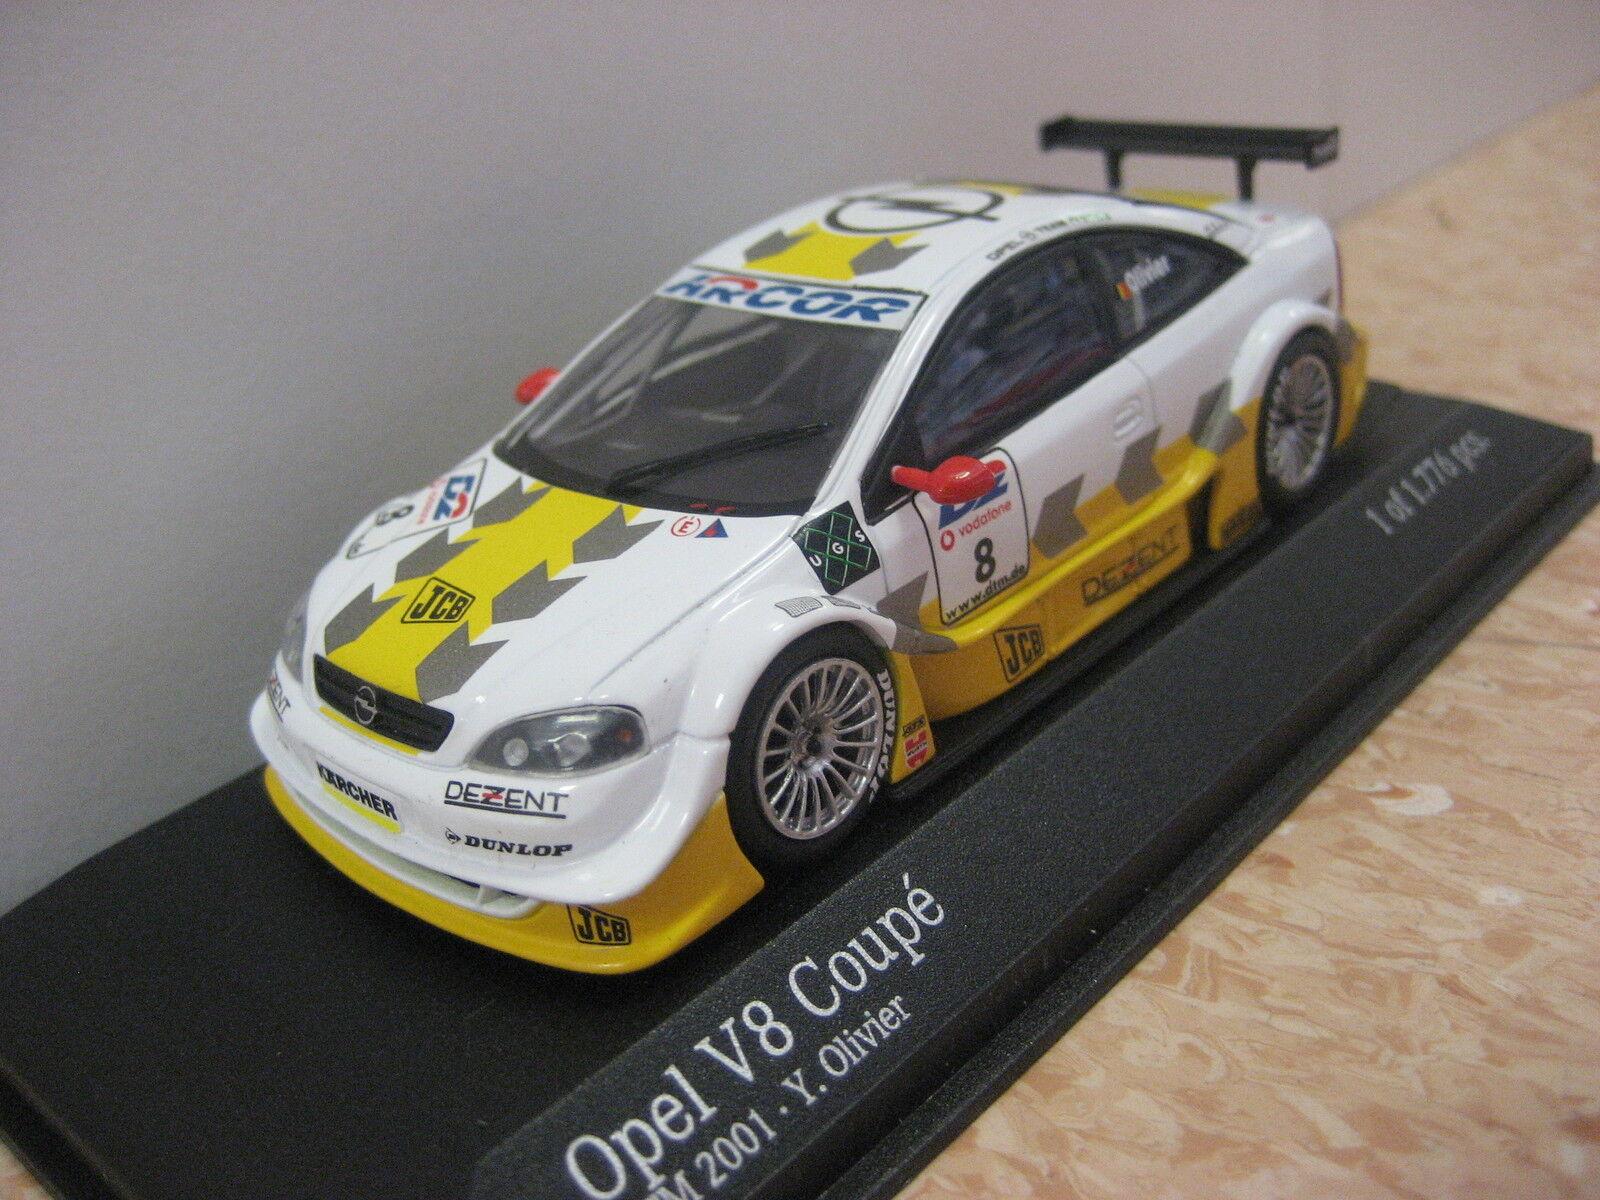 para mayoristas Opel v8 Coupe DTM DTM DTM 2001 y. olivier  8 1 43 Minichamps nuevo & OVP  comprar marca